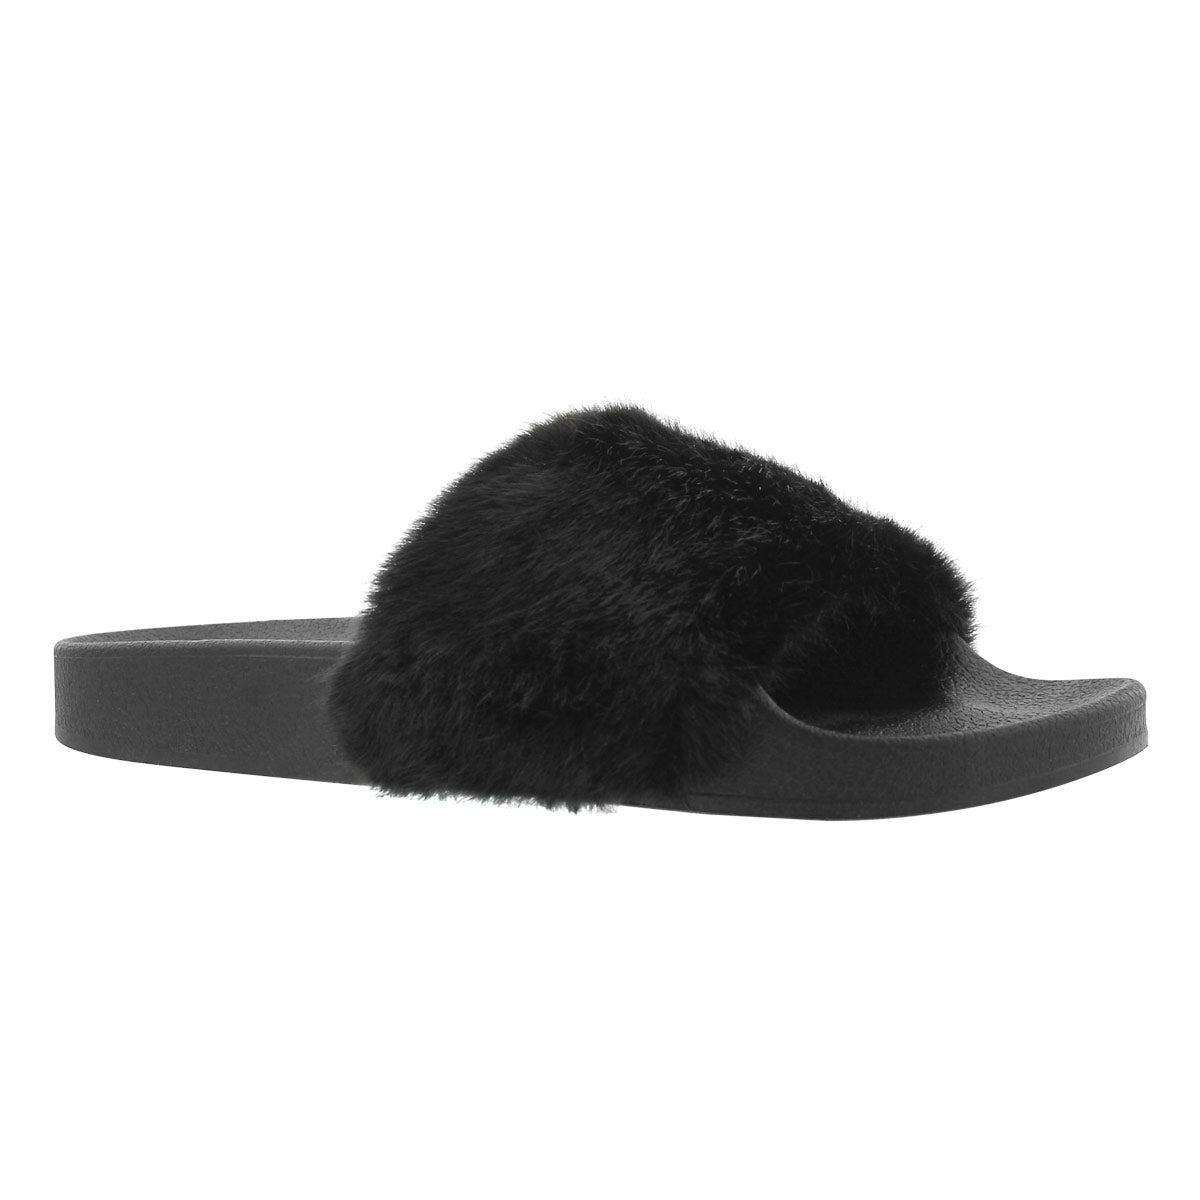 Women's SOFTEY black faux fur slide sandals